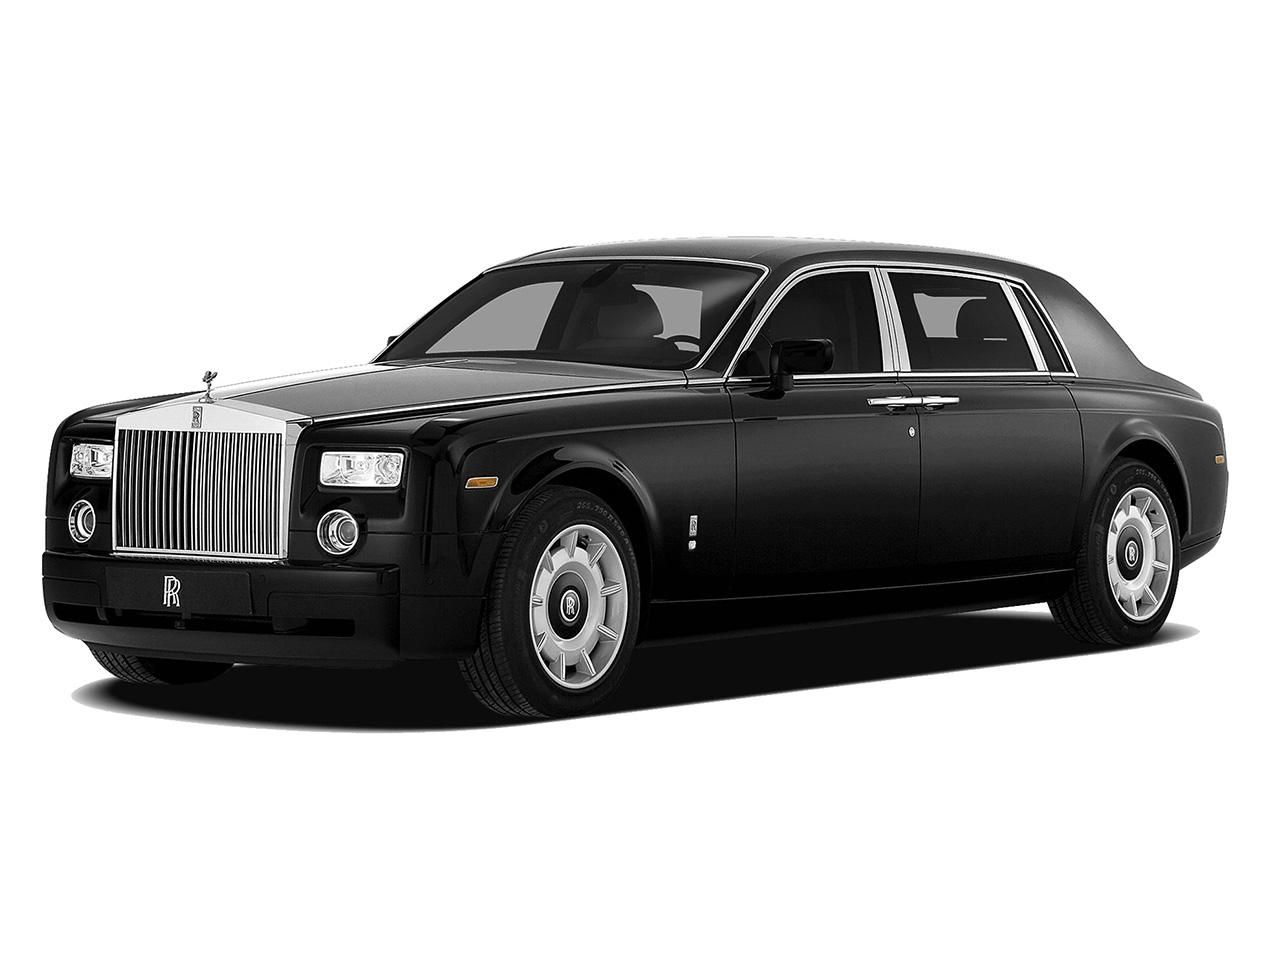 2017 rolls royce phantom prices in qatar gulf specs reviews for doha yallamotor. Black Bedroom Furniture Sets. Home Design Ideas